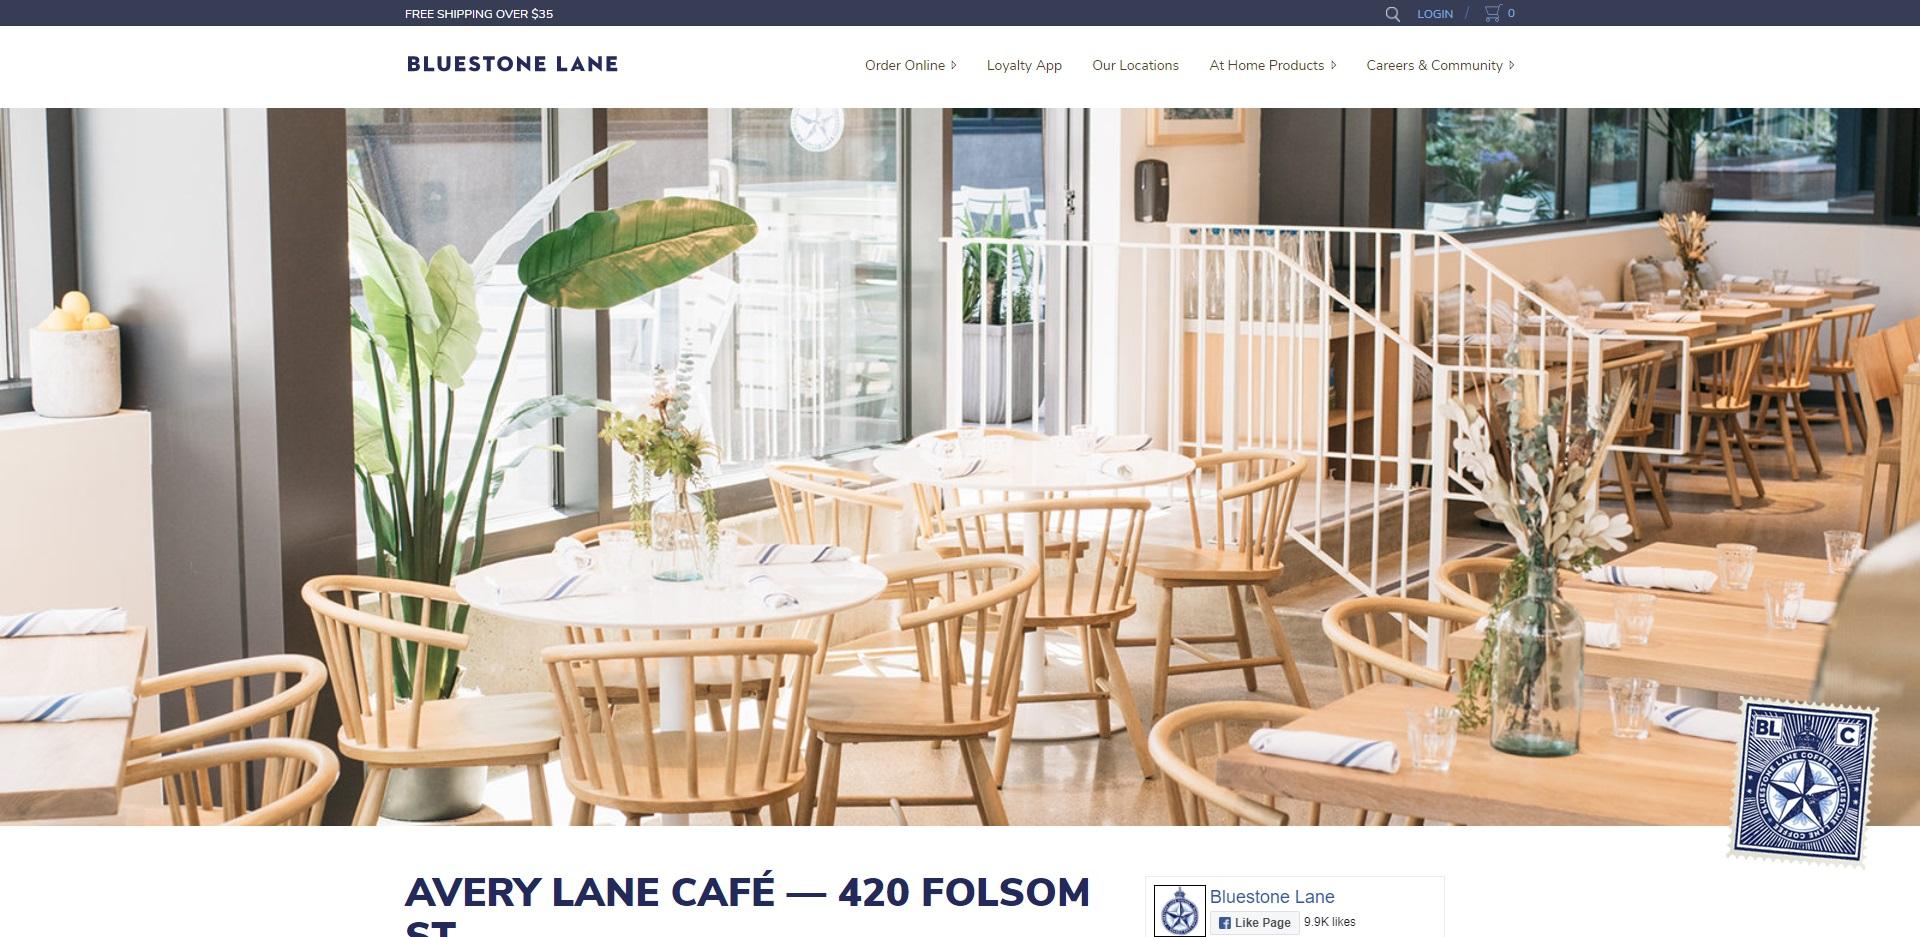 5 Best Australian Restaurants in San Francisco